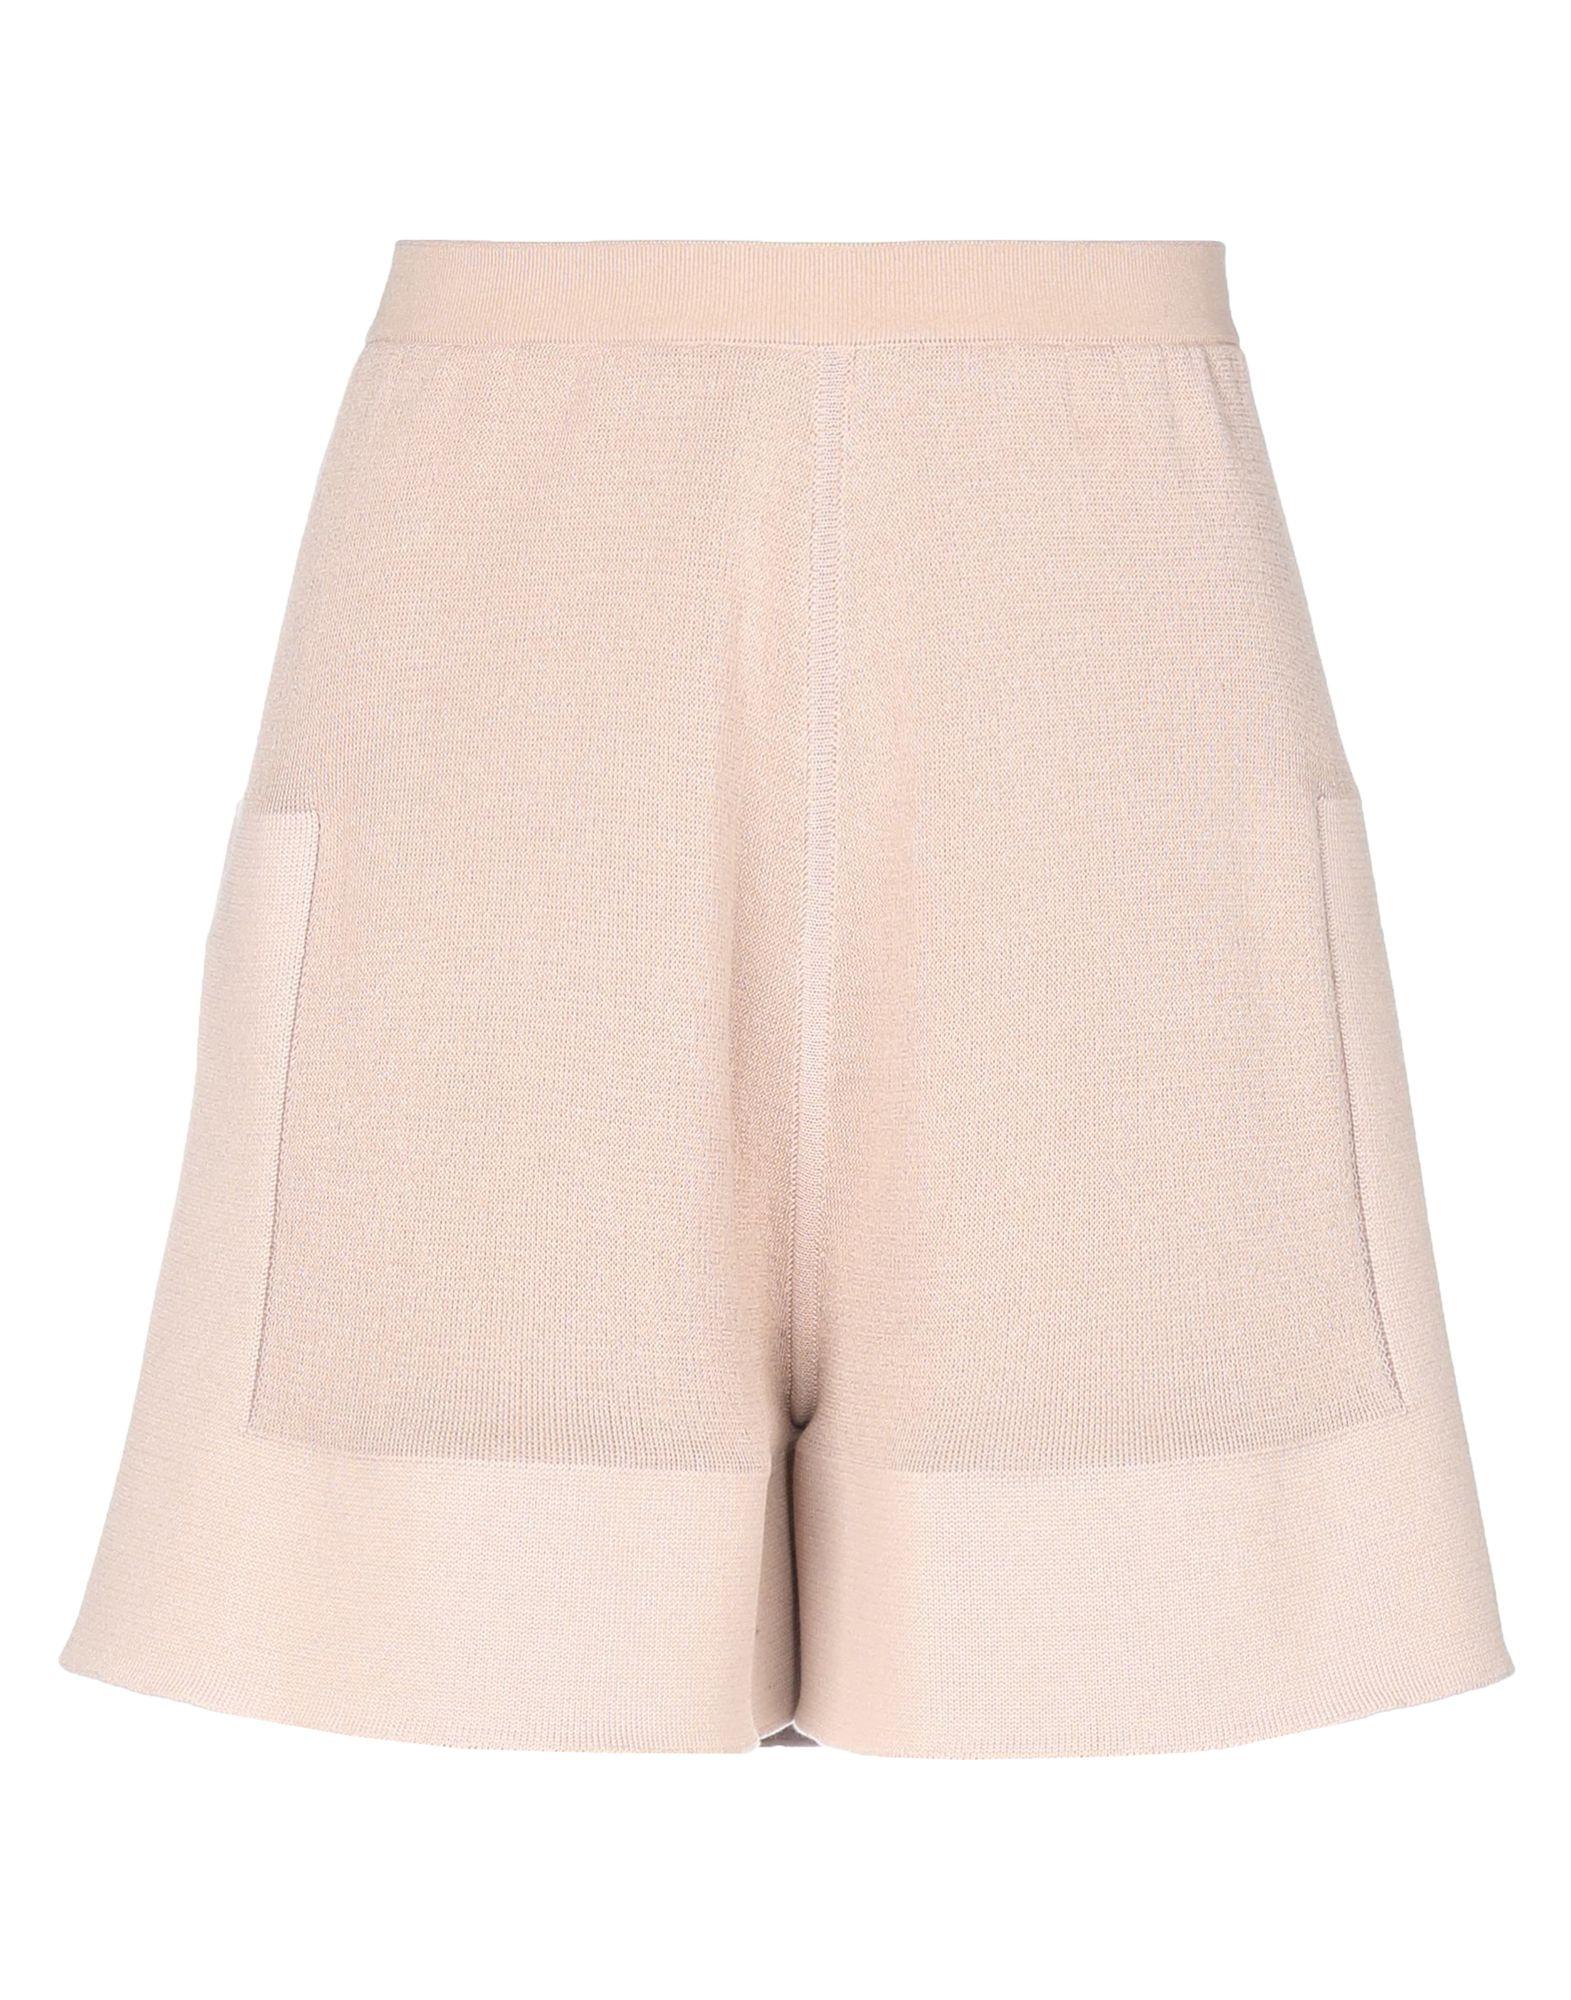 RICK OWENS Shorts. knitted, no appliqués, lightweight sweater, basic solid color, elasticized waist, no pockets, side slit hemline. 97% Cotton, 2% Polyamide, 1% Elastane